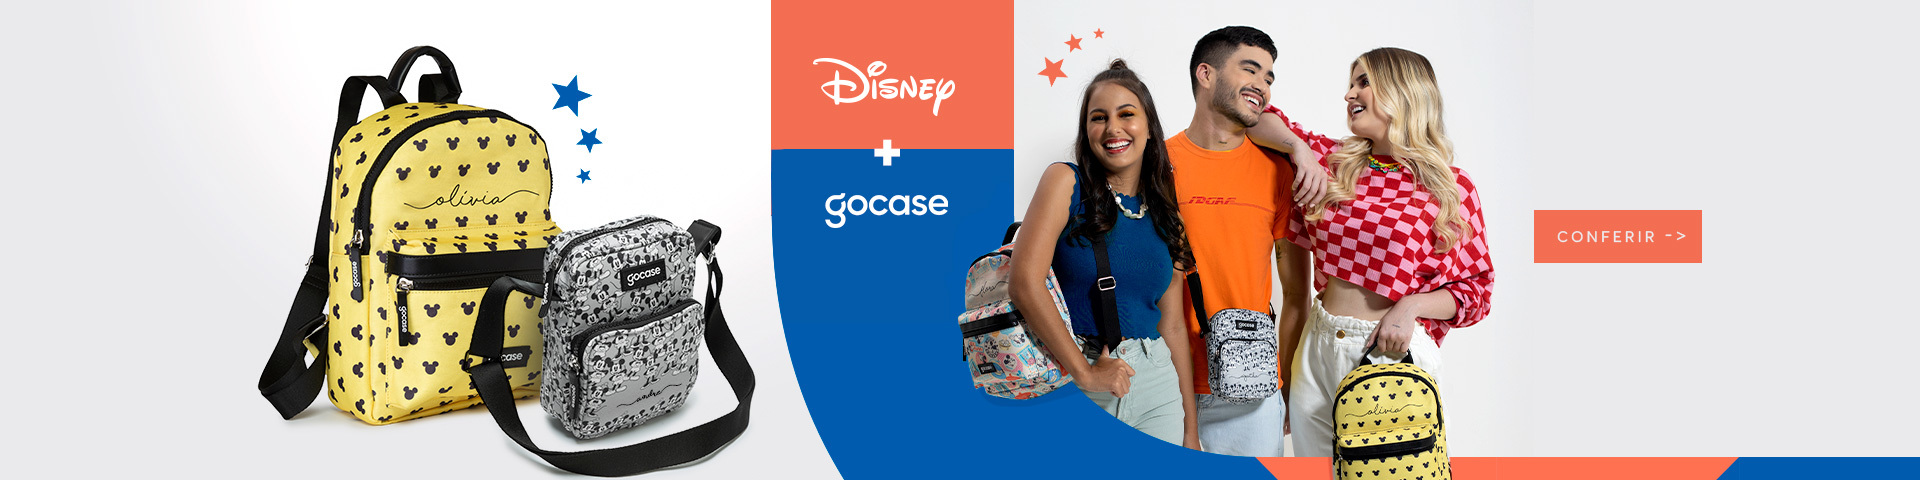 Lançamento Disney Têxteis